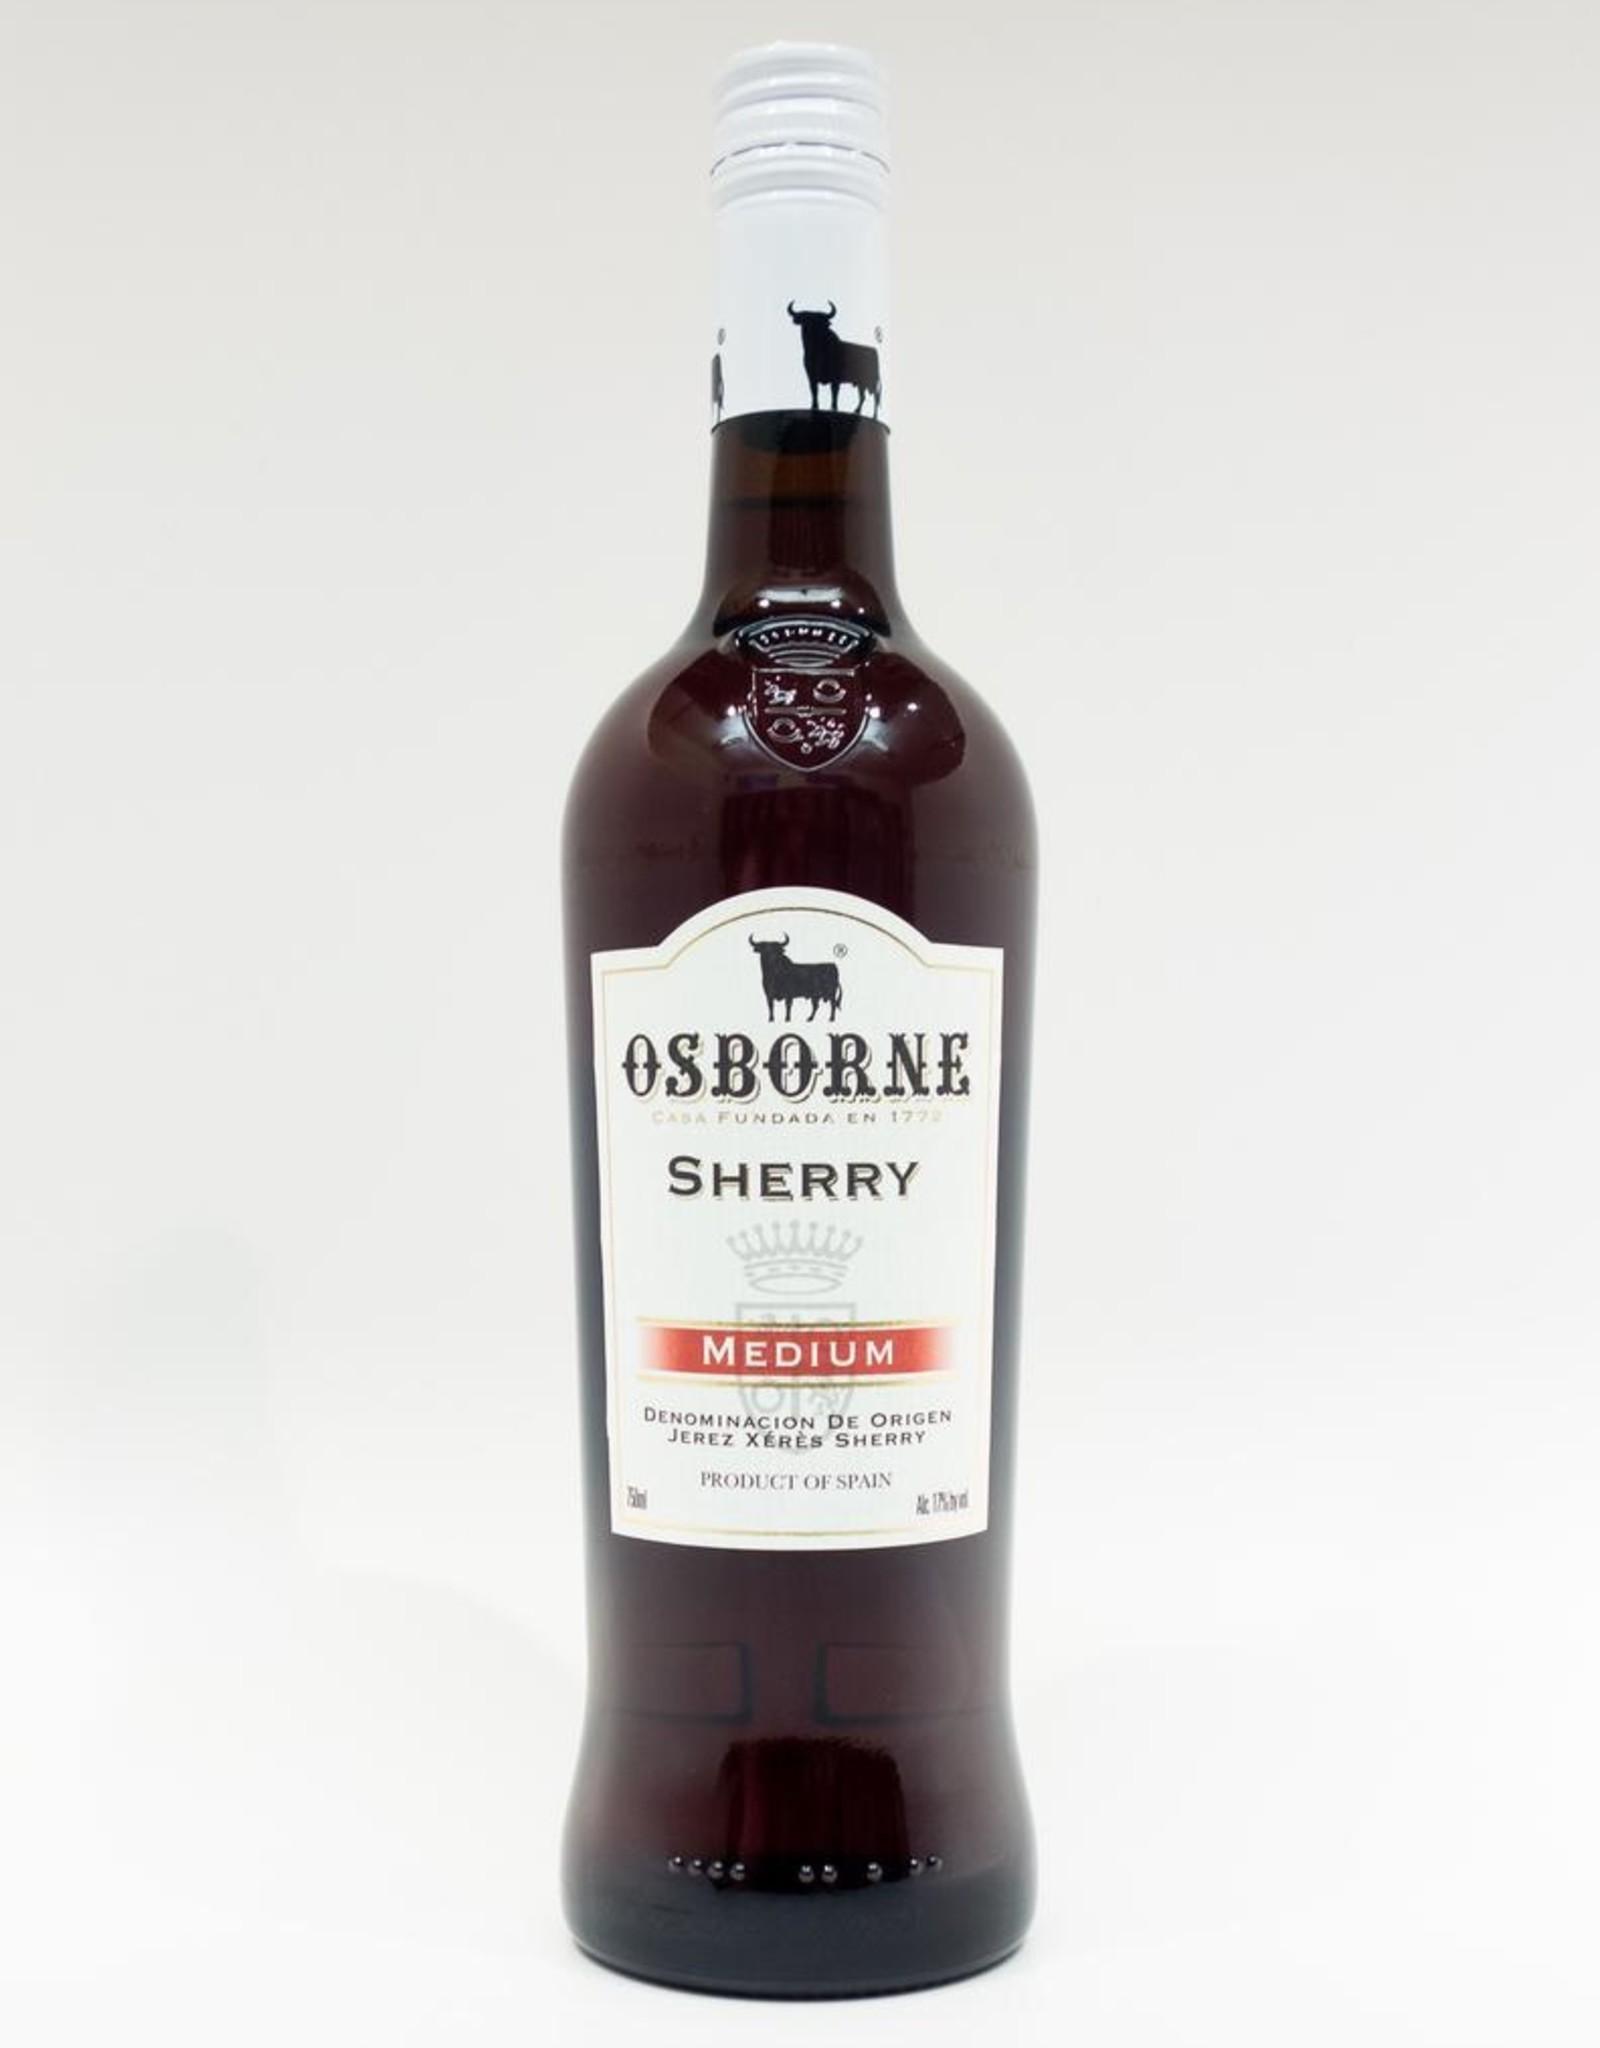 Wine-Fortified-Sherry Osborne Medium Sherry